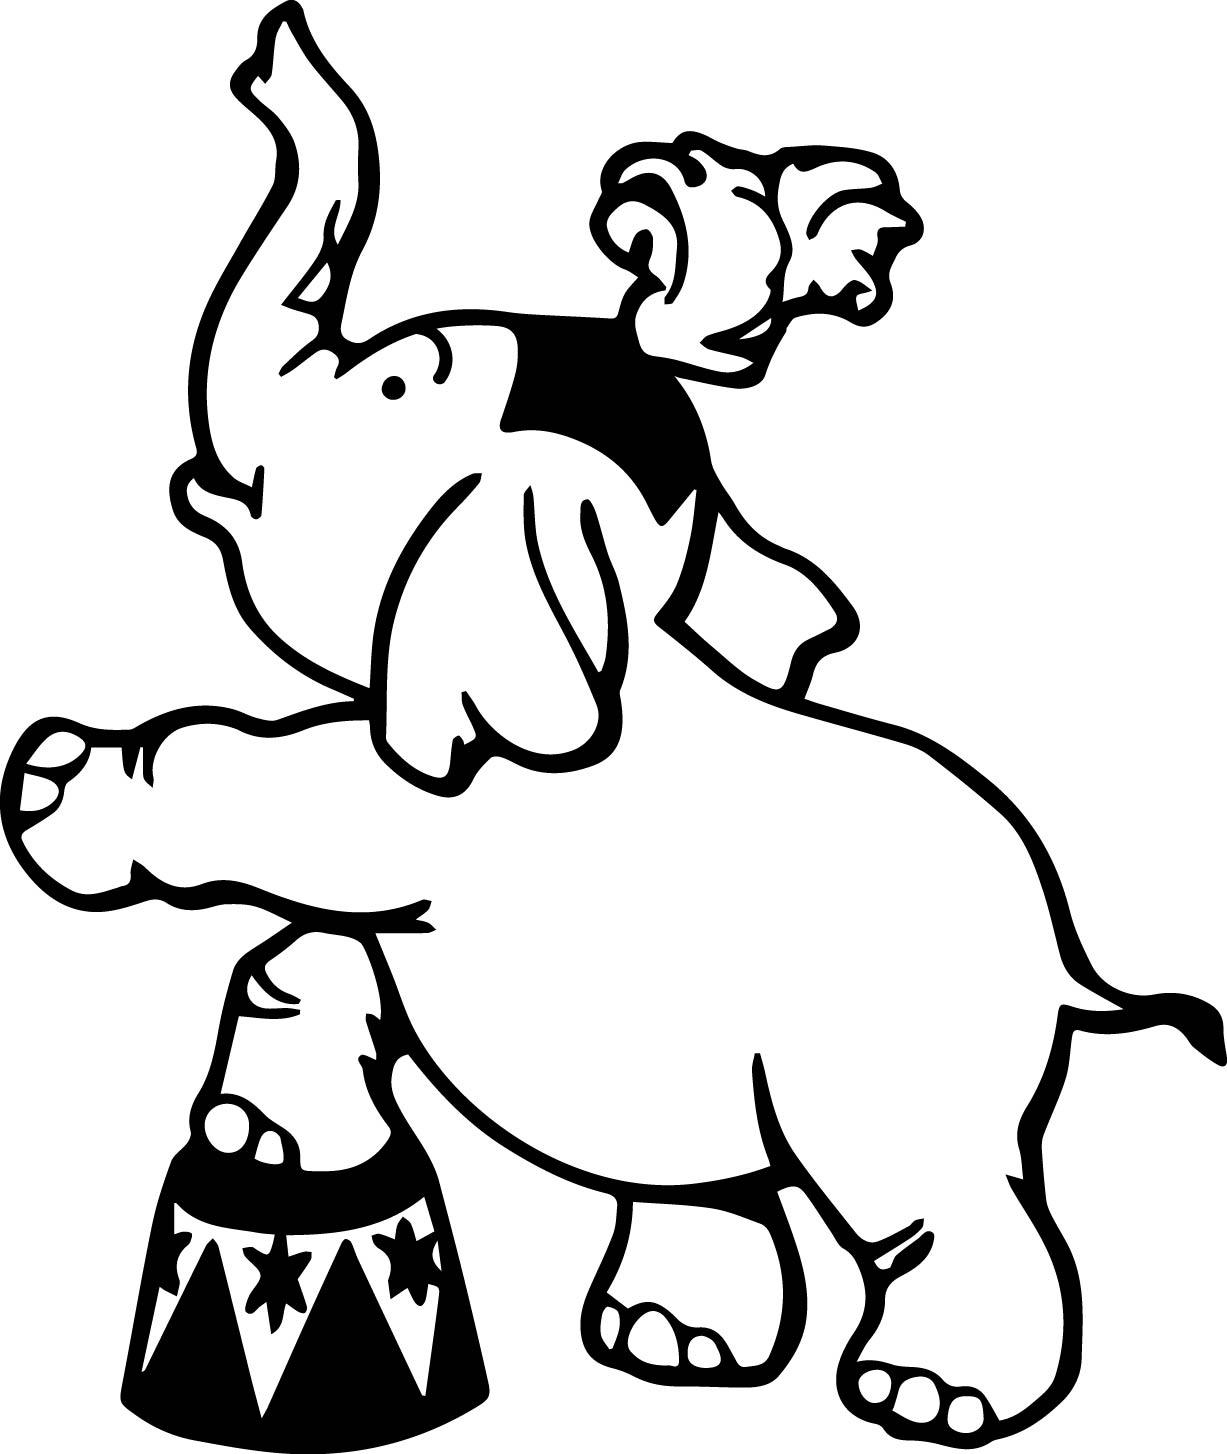 1227x1454 Circus Elephant Coloring